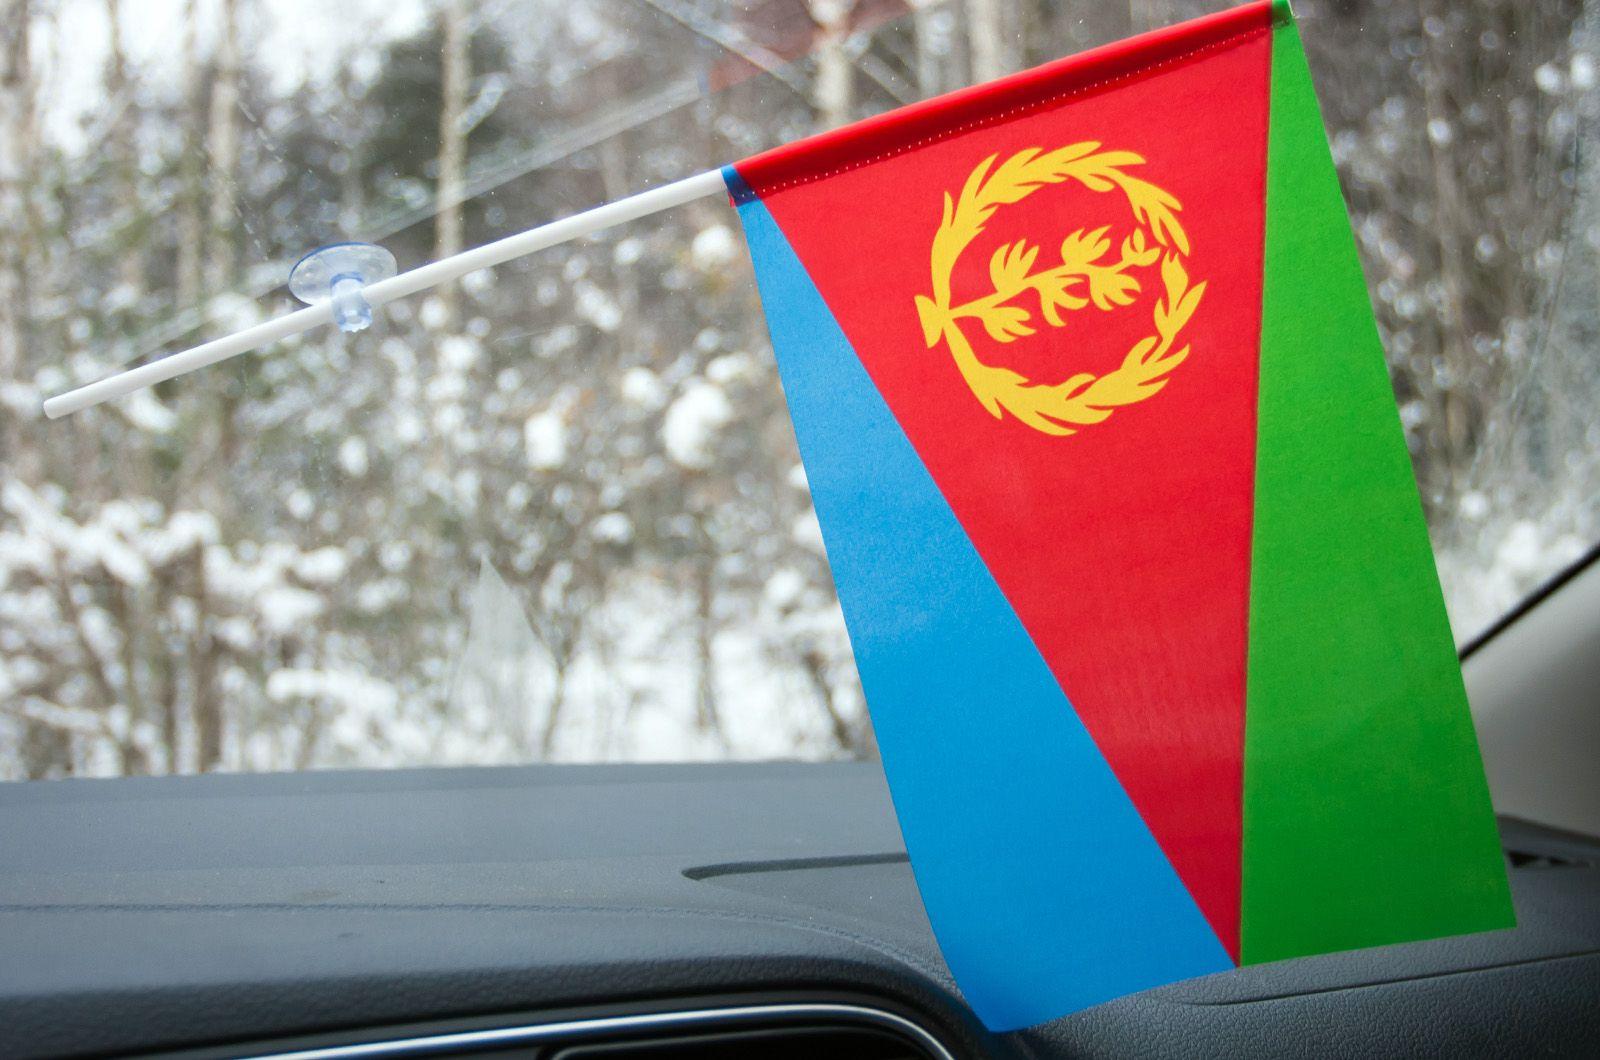 Флажок Эритреи в машину